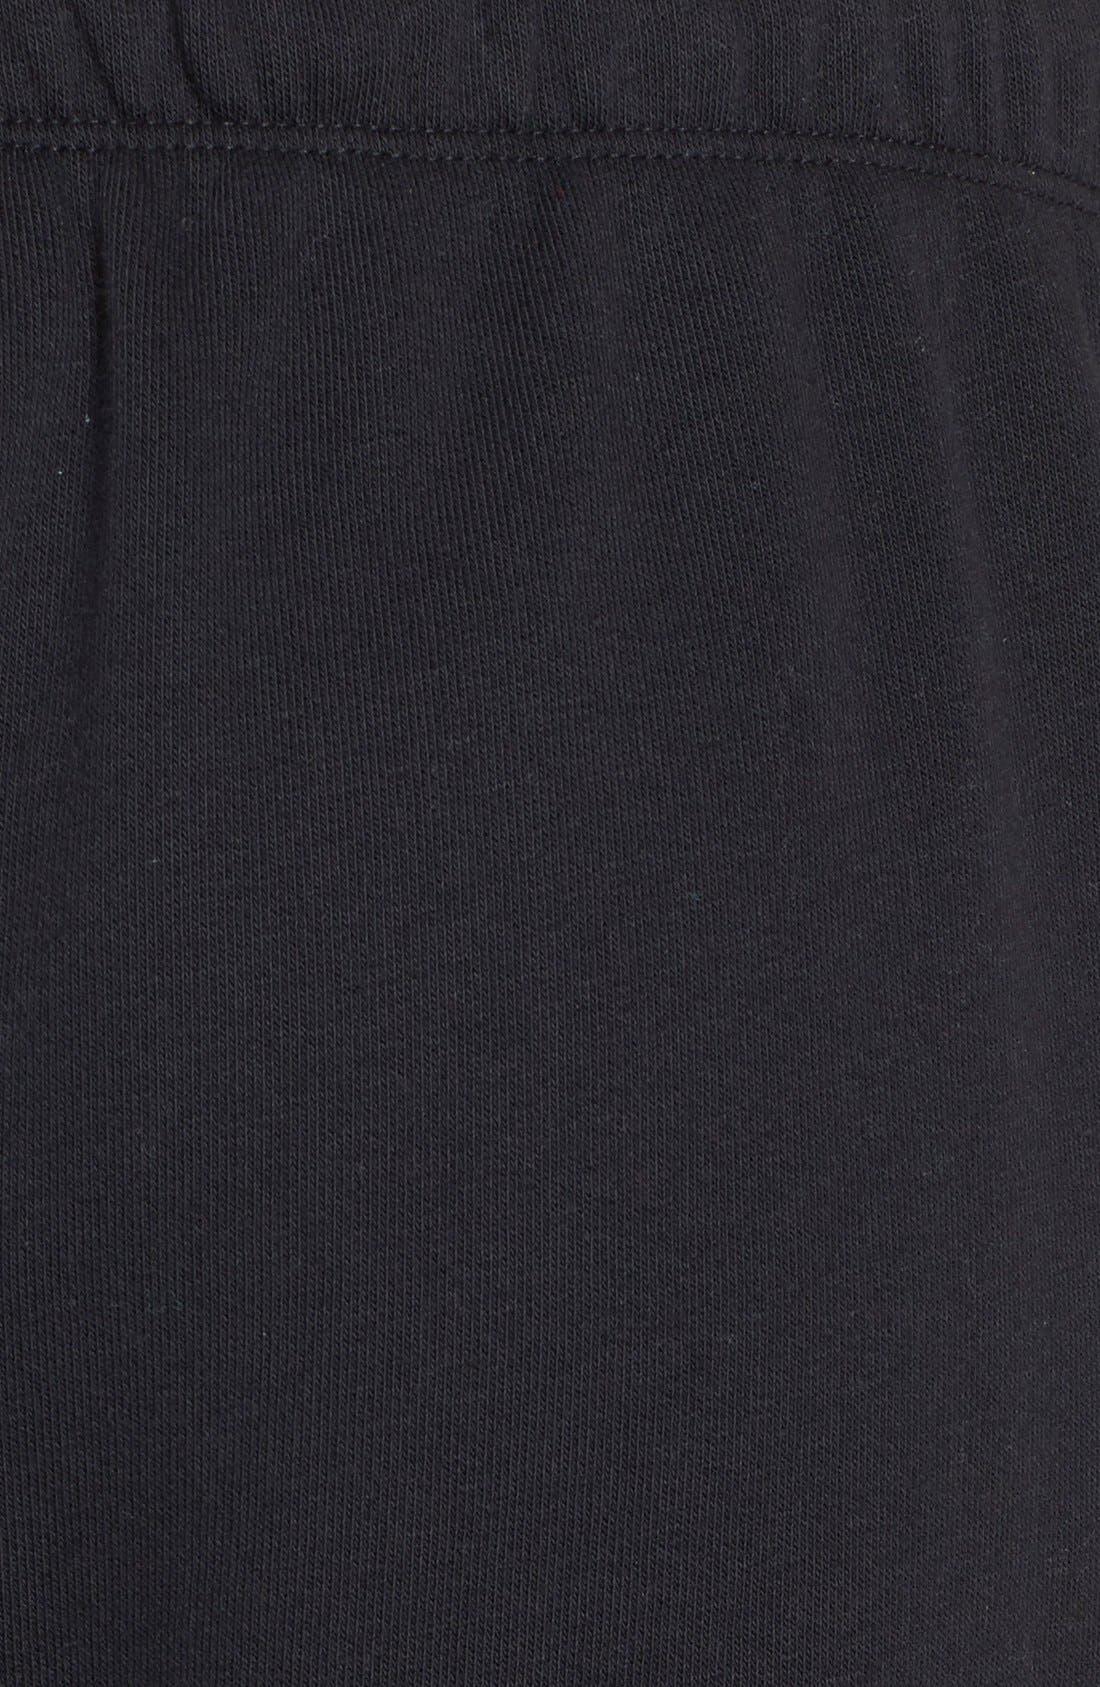 Alternate Image 3  - Nike 'Rally' Sequin Logo Sweatpants